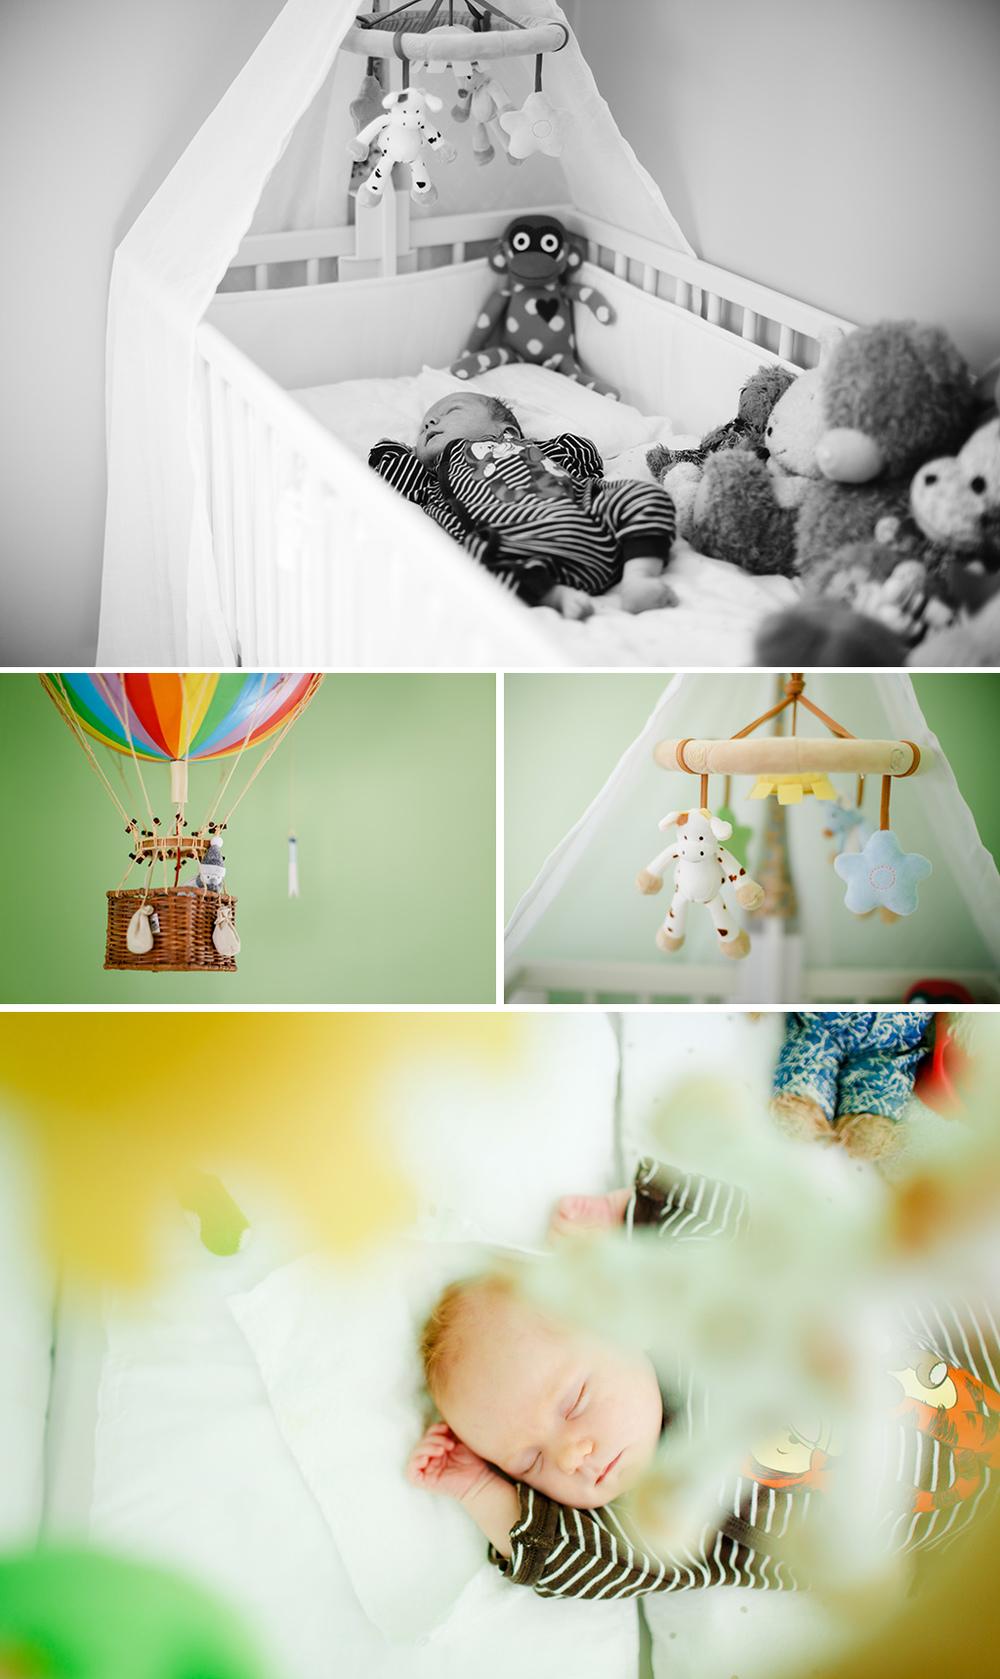 Nyfoddfotografering_newborn_familjefotograf_hemma-hosfotografering-1.jpg